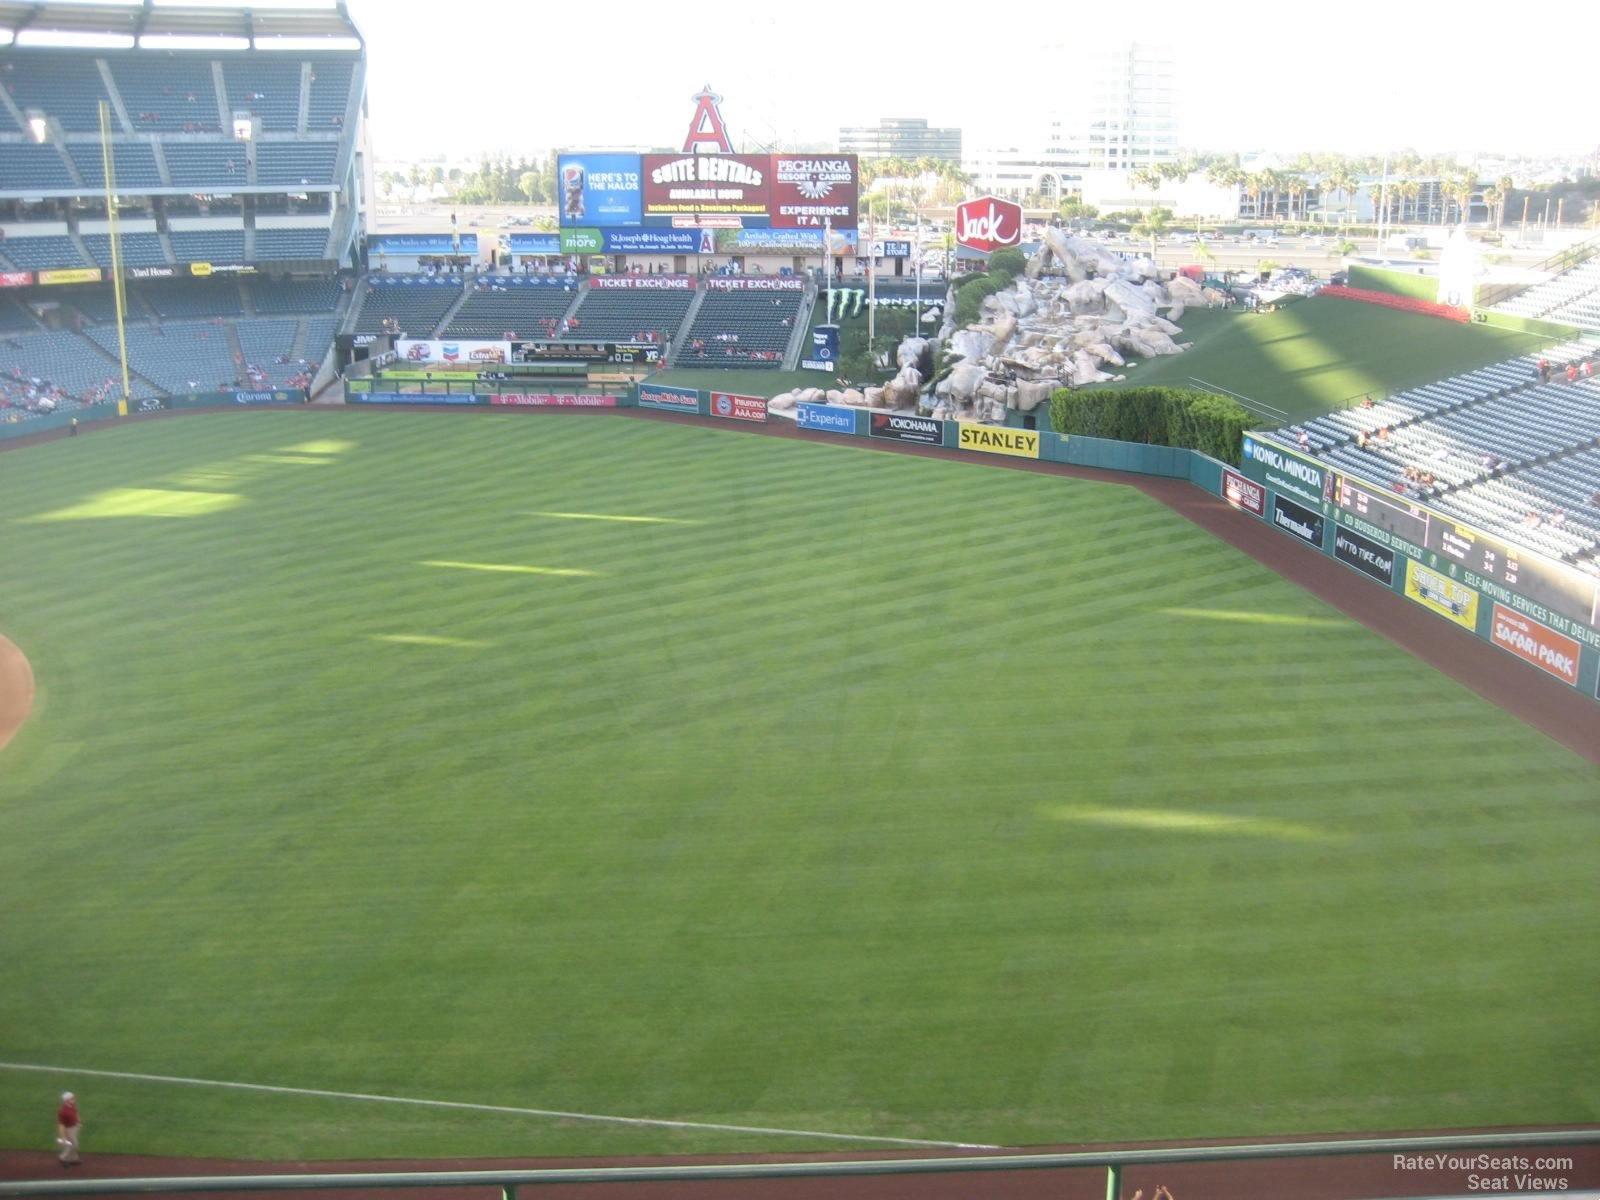 Angel Stadium Section 429 - RateYourSeats.com